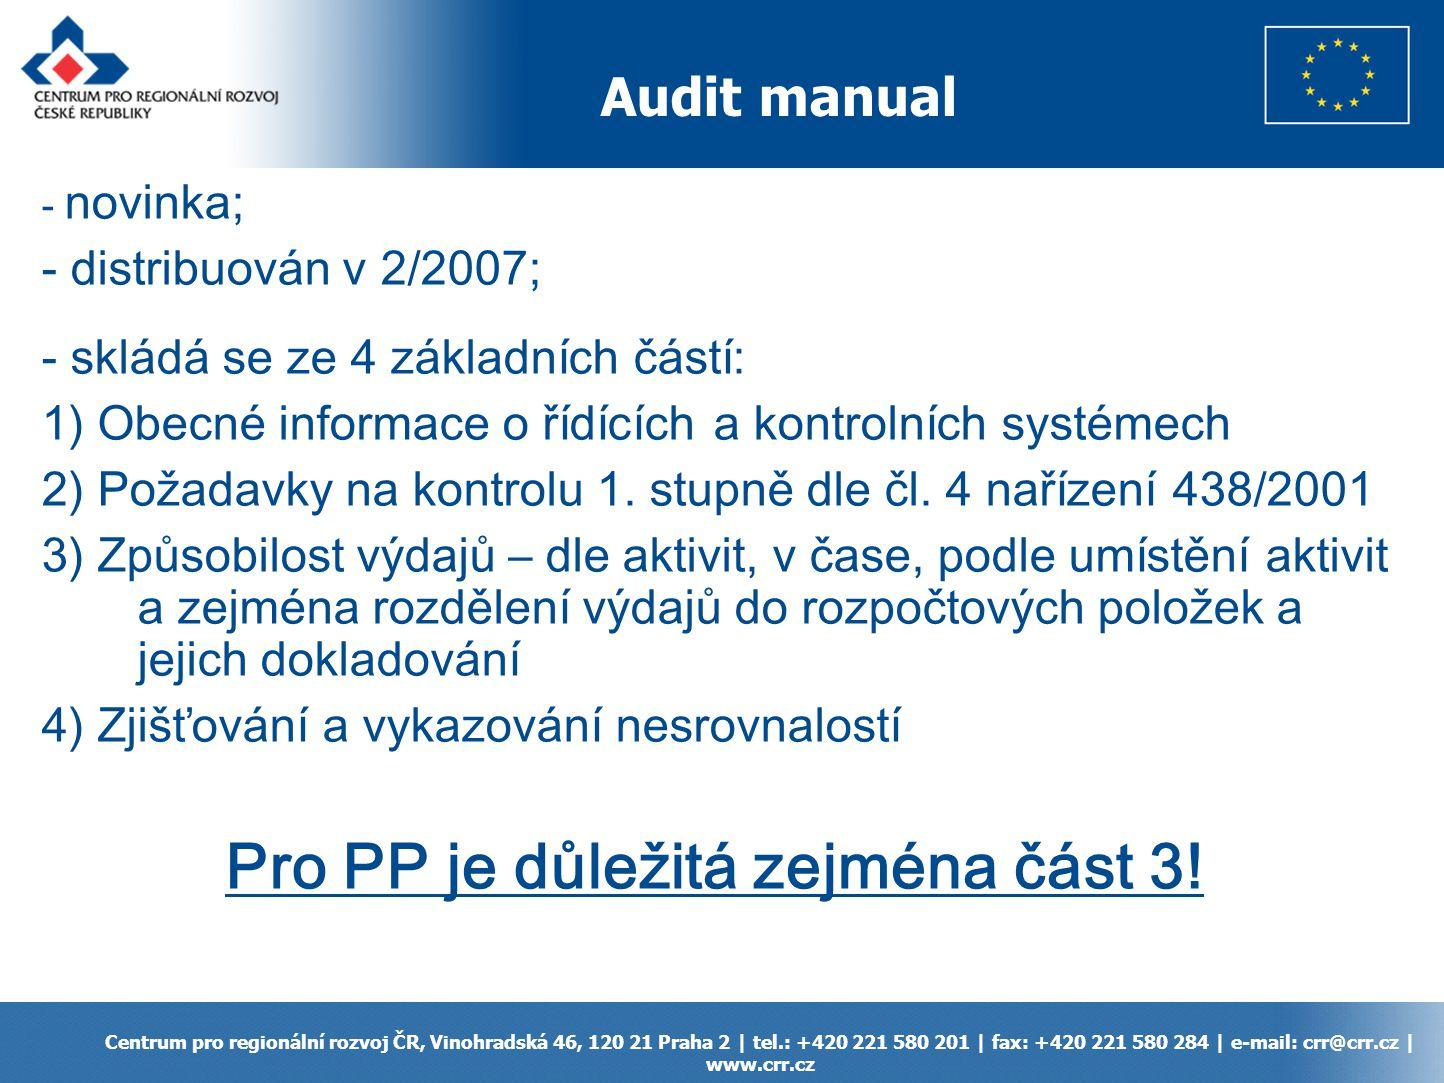 Audit manual Centrum pro regionální rozvoj ČR, Vinohradská 46, 120 21 Praha 2 | tel.: +420 221 580 201 | fax: +420 221 580 284 | e-mail: crr@crr.cz |